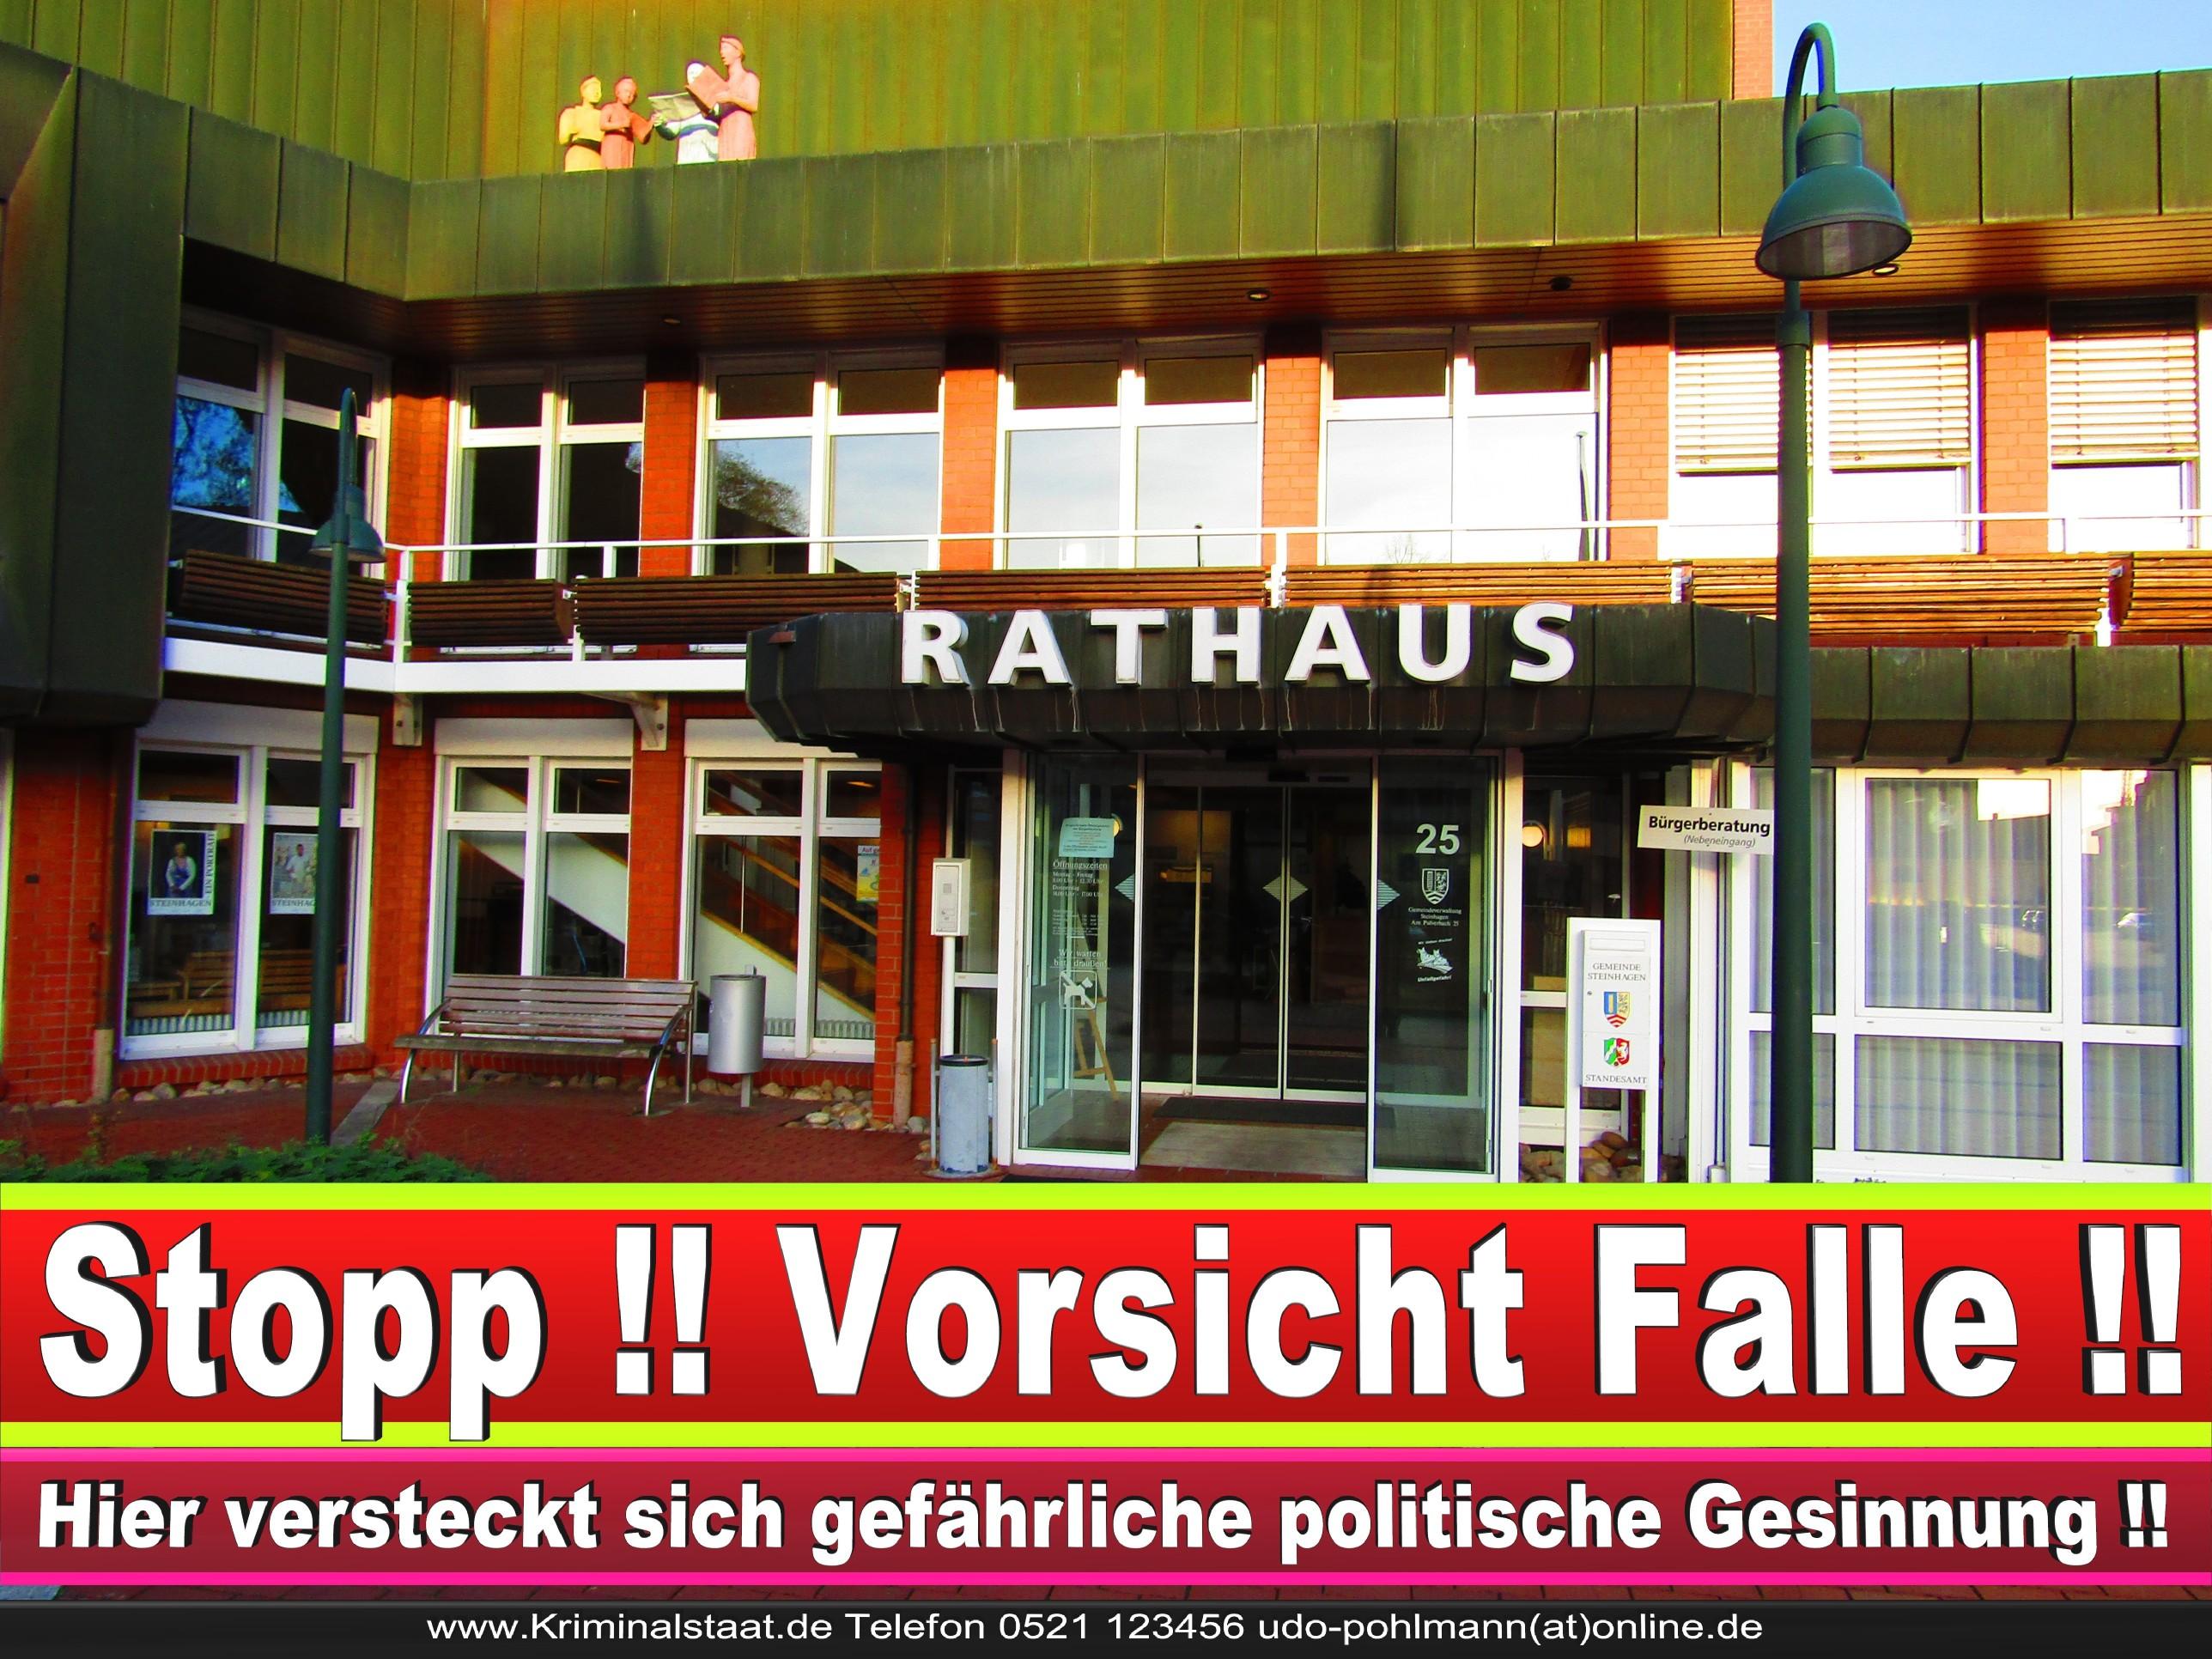 Rathaus Steinhagen CDU SPD FDP Ortsverband CDU Bürgerbüro CDU SPD Korruption Polizei Bürgermeister Karte Telefonbuch NRW OWL (16)